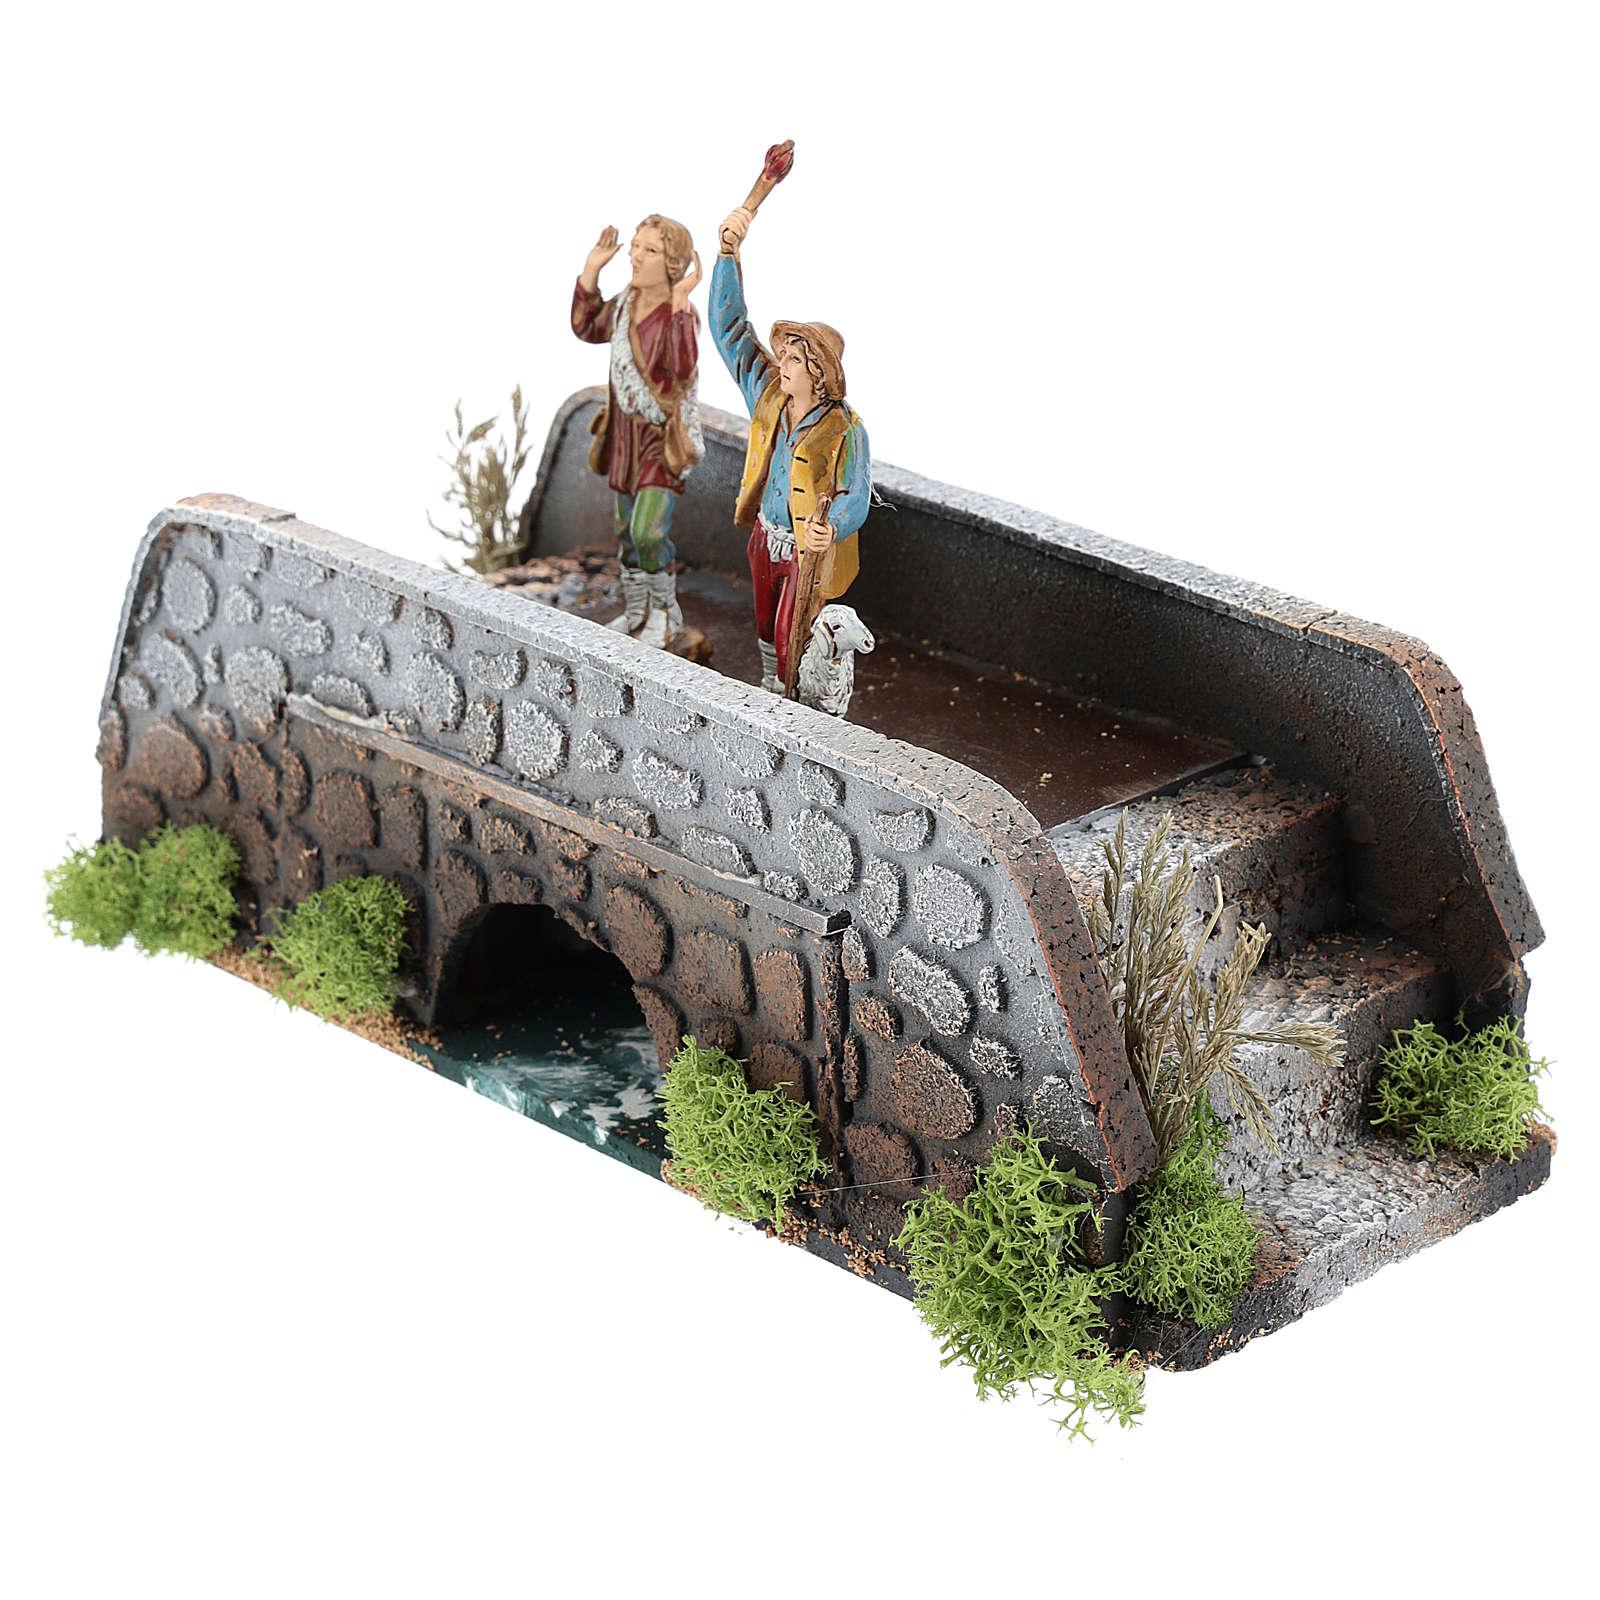 Moving shepherds on bridge of 10x25x10 cm, 12 cm nativity 3